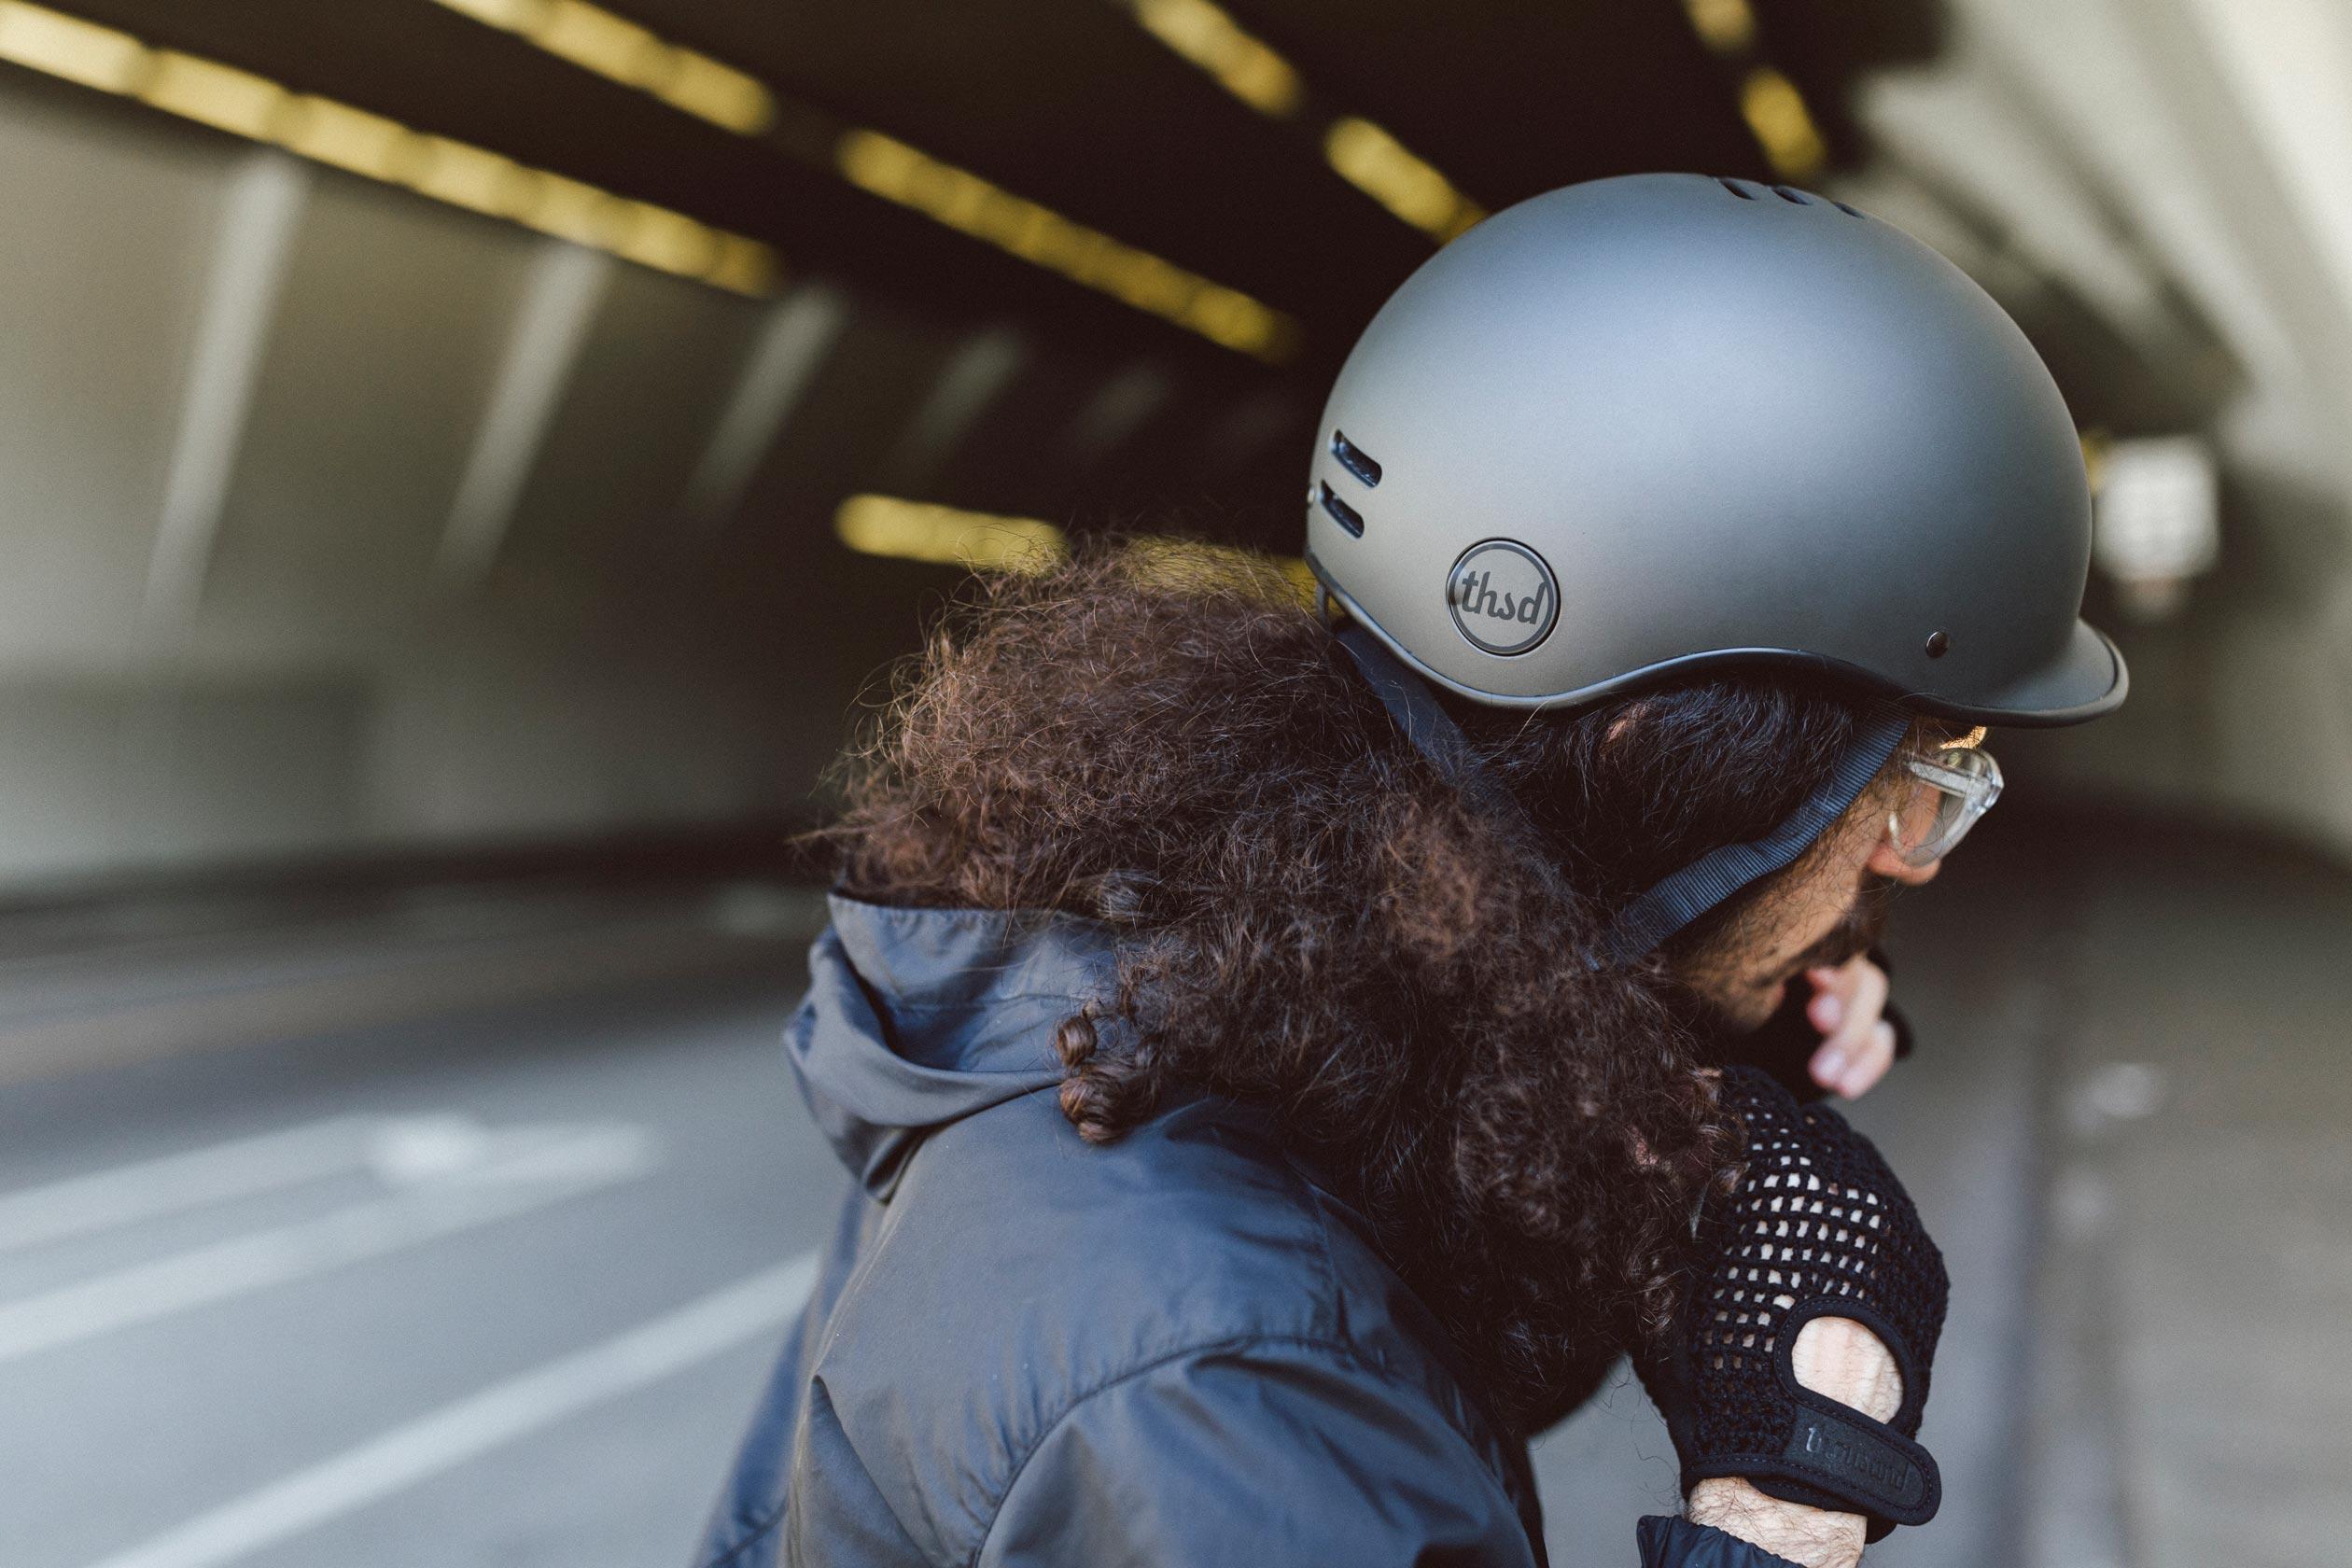 Heritage Bike Helmet, Stealth Black